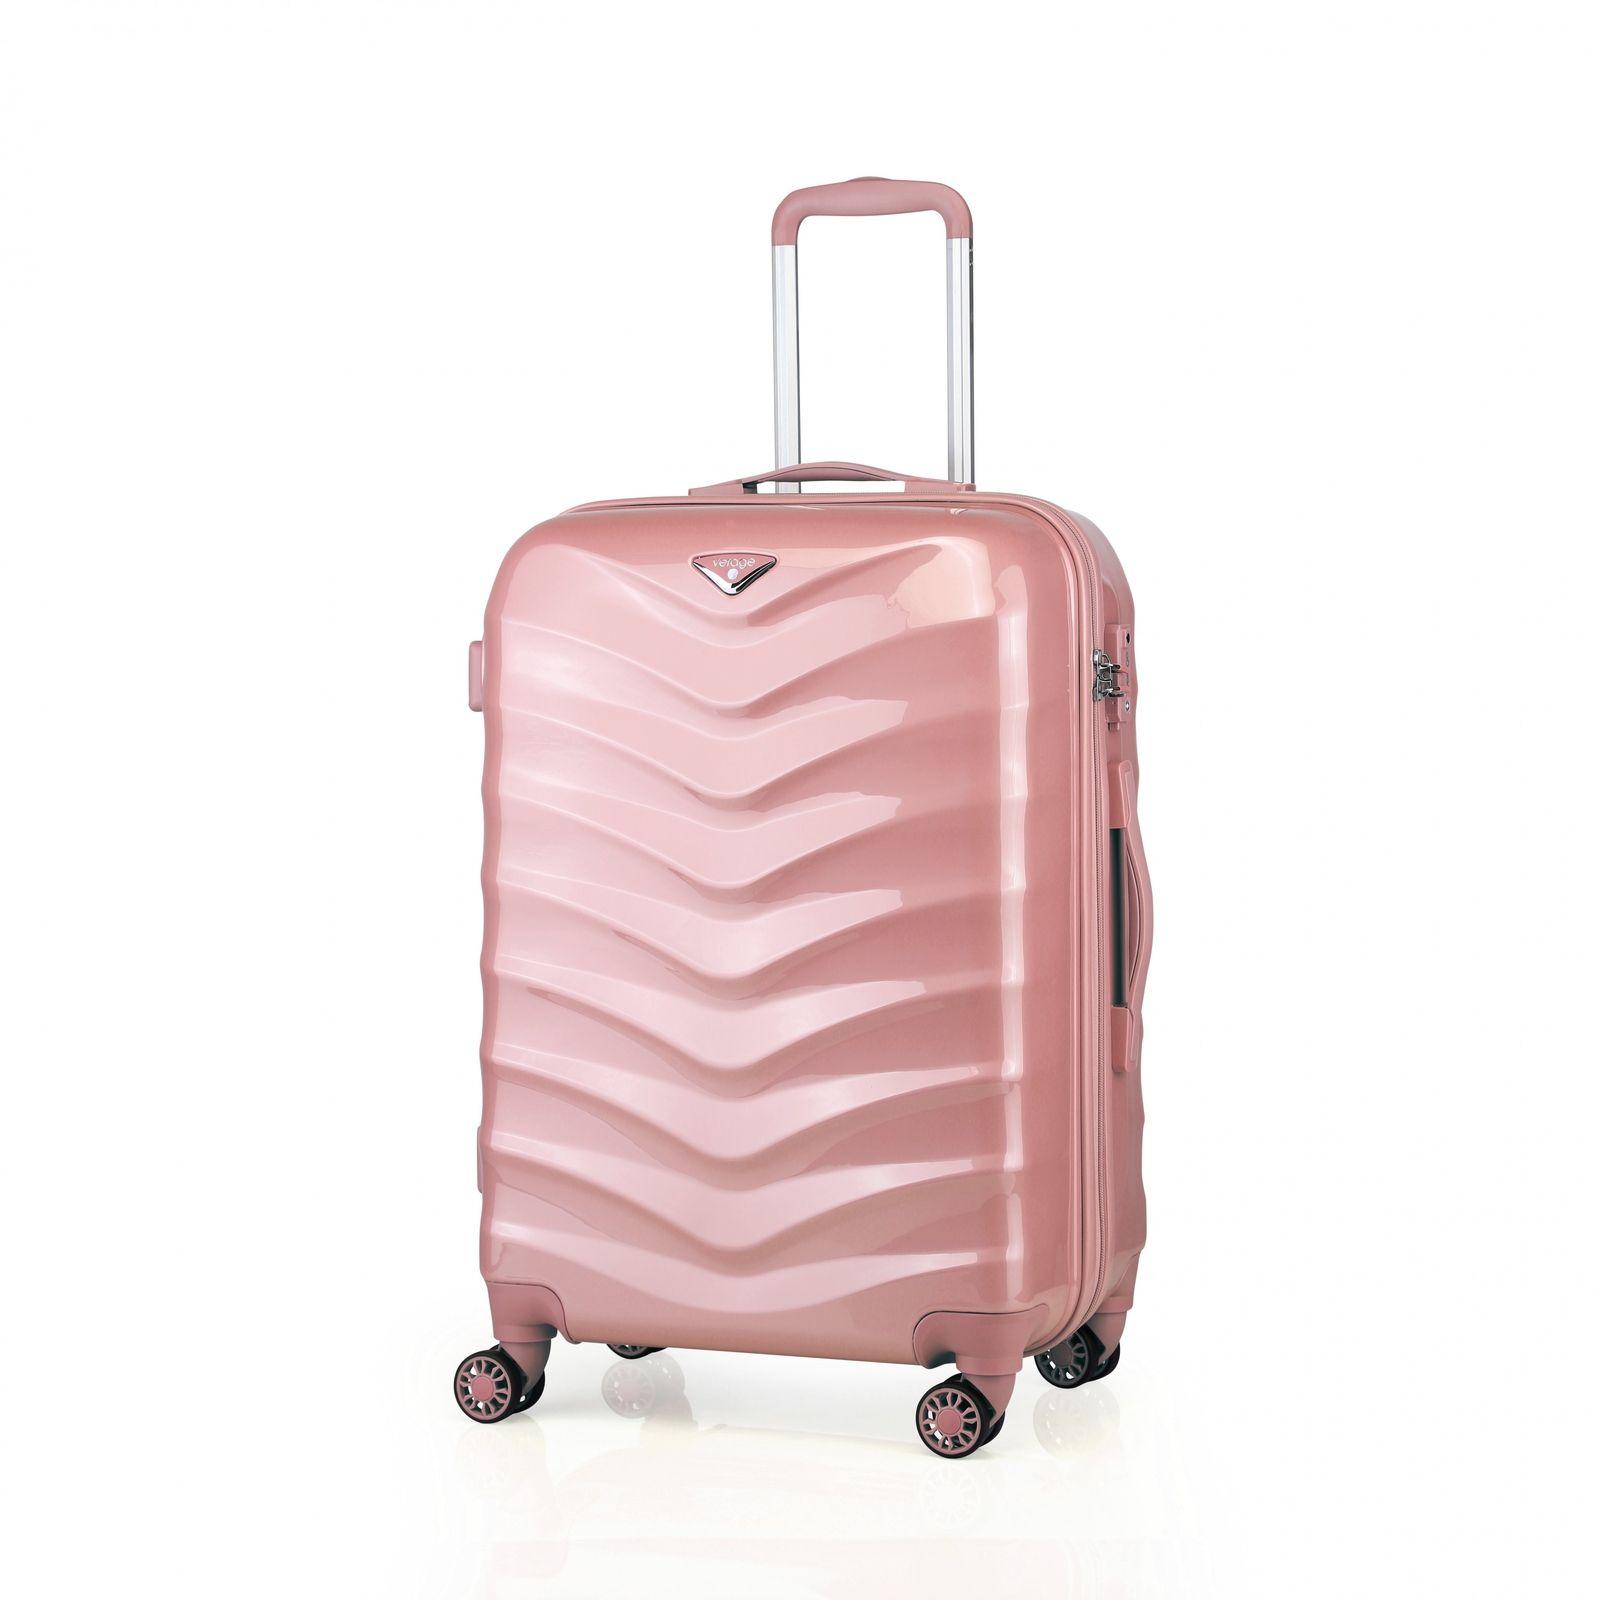 verage seagull koffer handgep ck trolley tsa schloss rosegold blau pink rosa set ebay. Black Bedroom Furniture Sets. Home Design Ideas